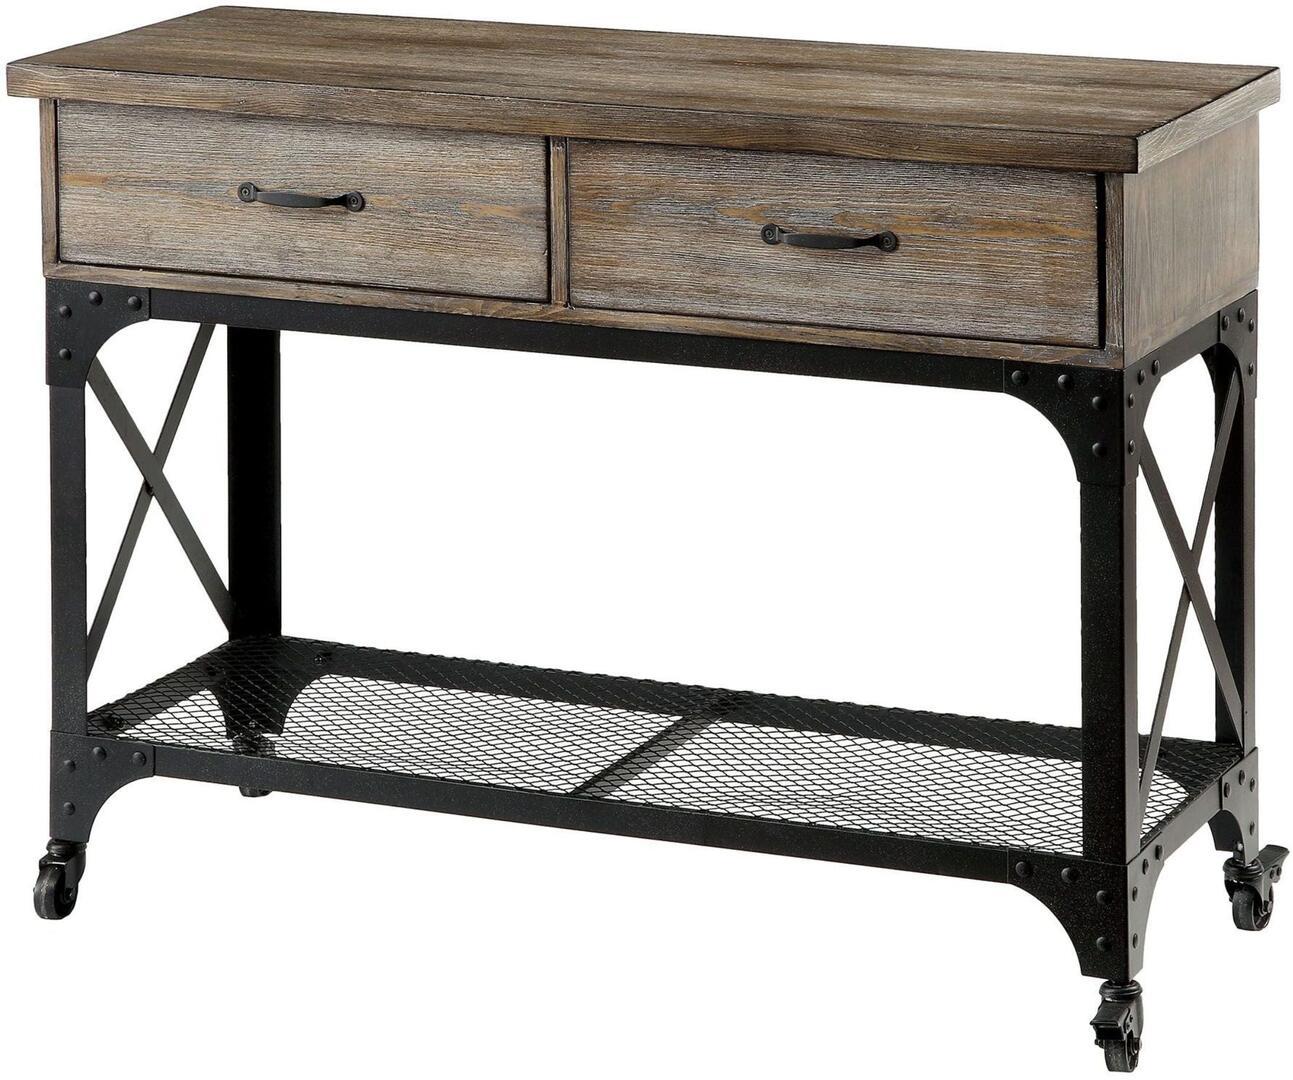 Cool Furniture Of America Cm4373S Machost Co Dining Chair Design Ideas Machostcouk